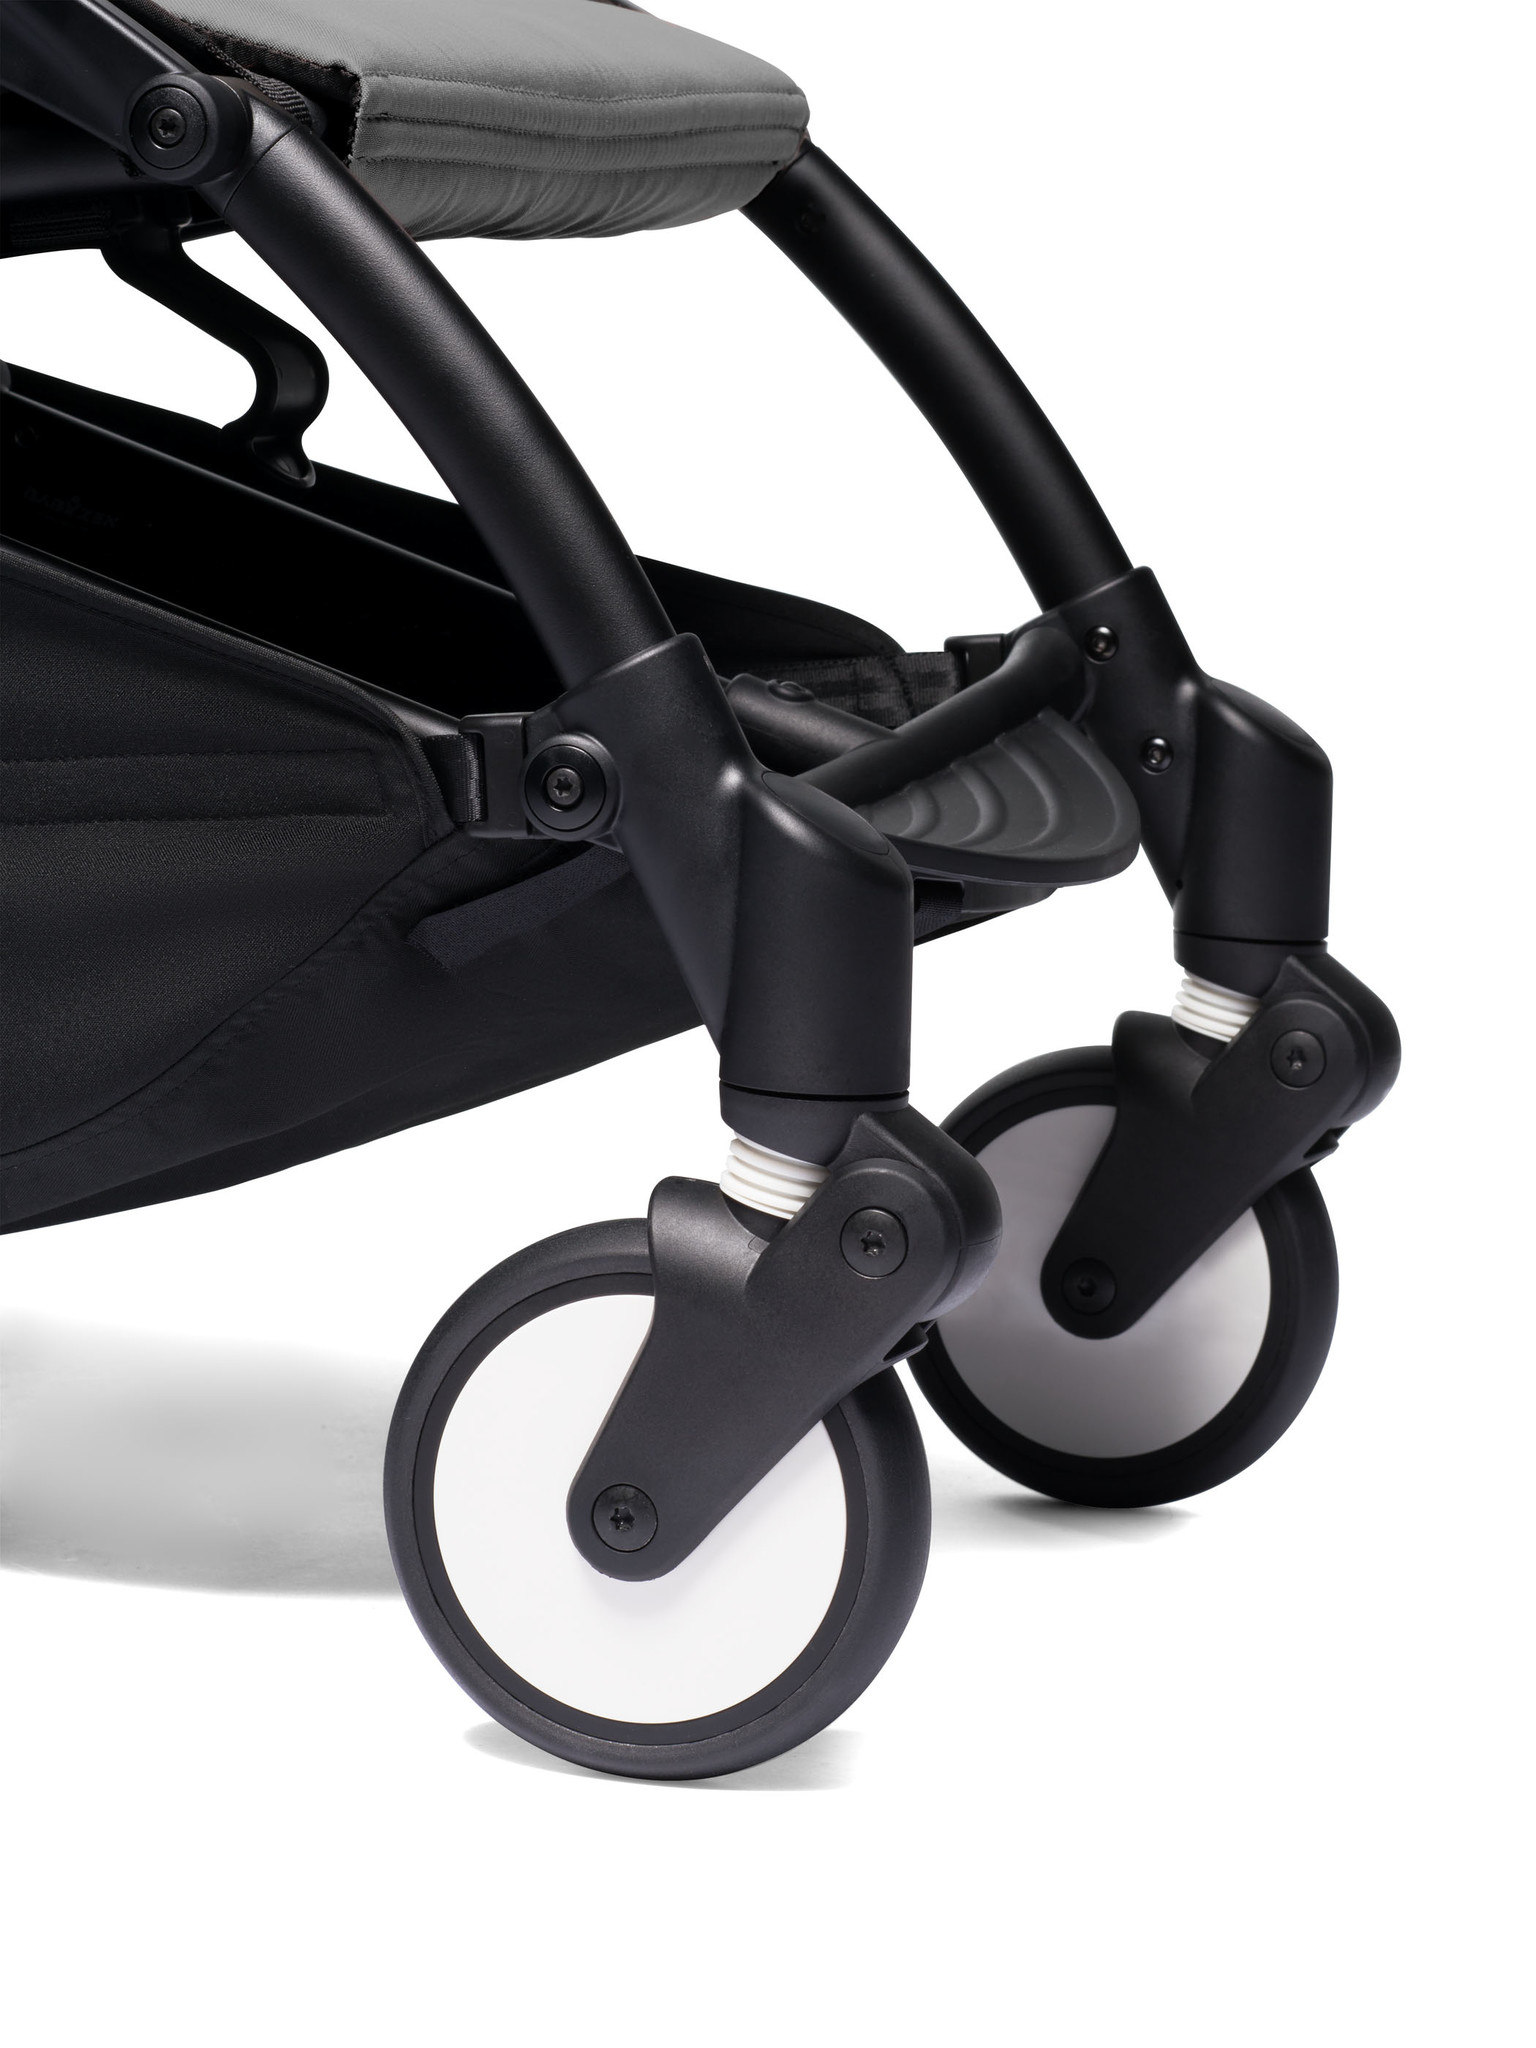 Babyzen Babyzen YOYO² buggy COMPLEET / FULL SET 0+ and 6+ grijs frame zwart